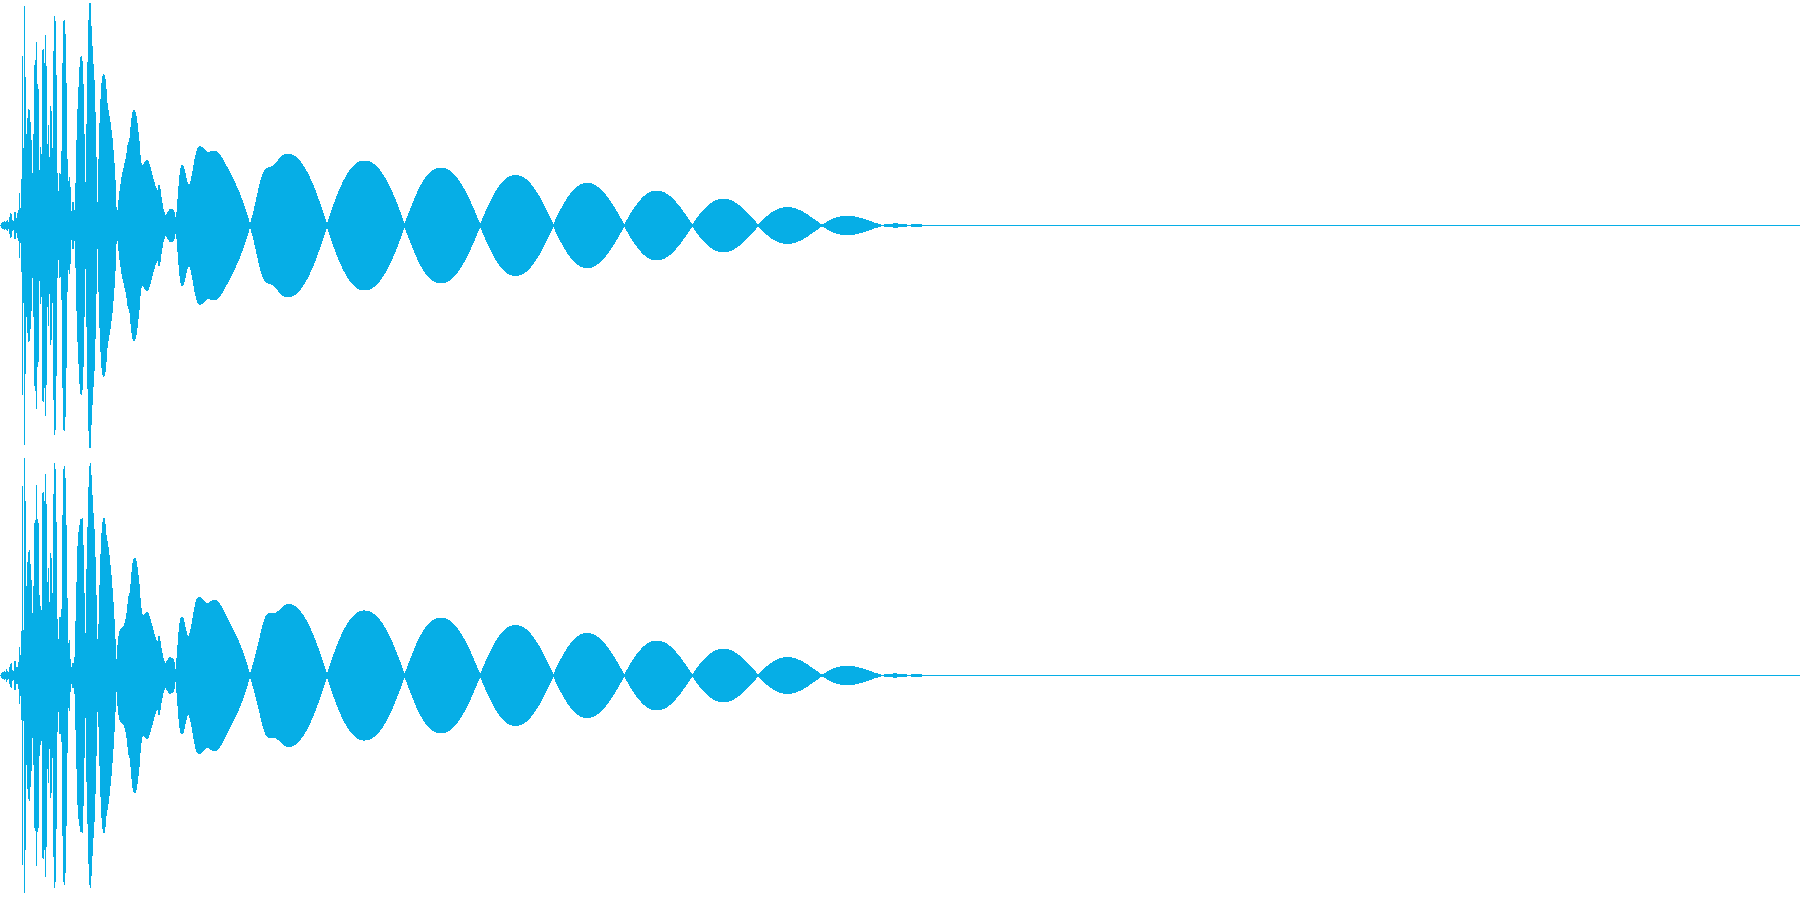 DTM Kick 2 オリジナル音源の再生済みの波形